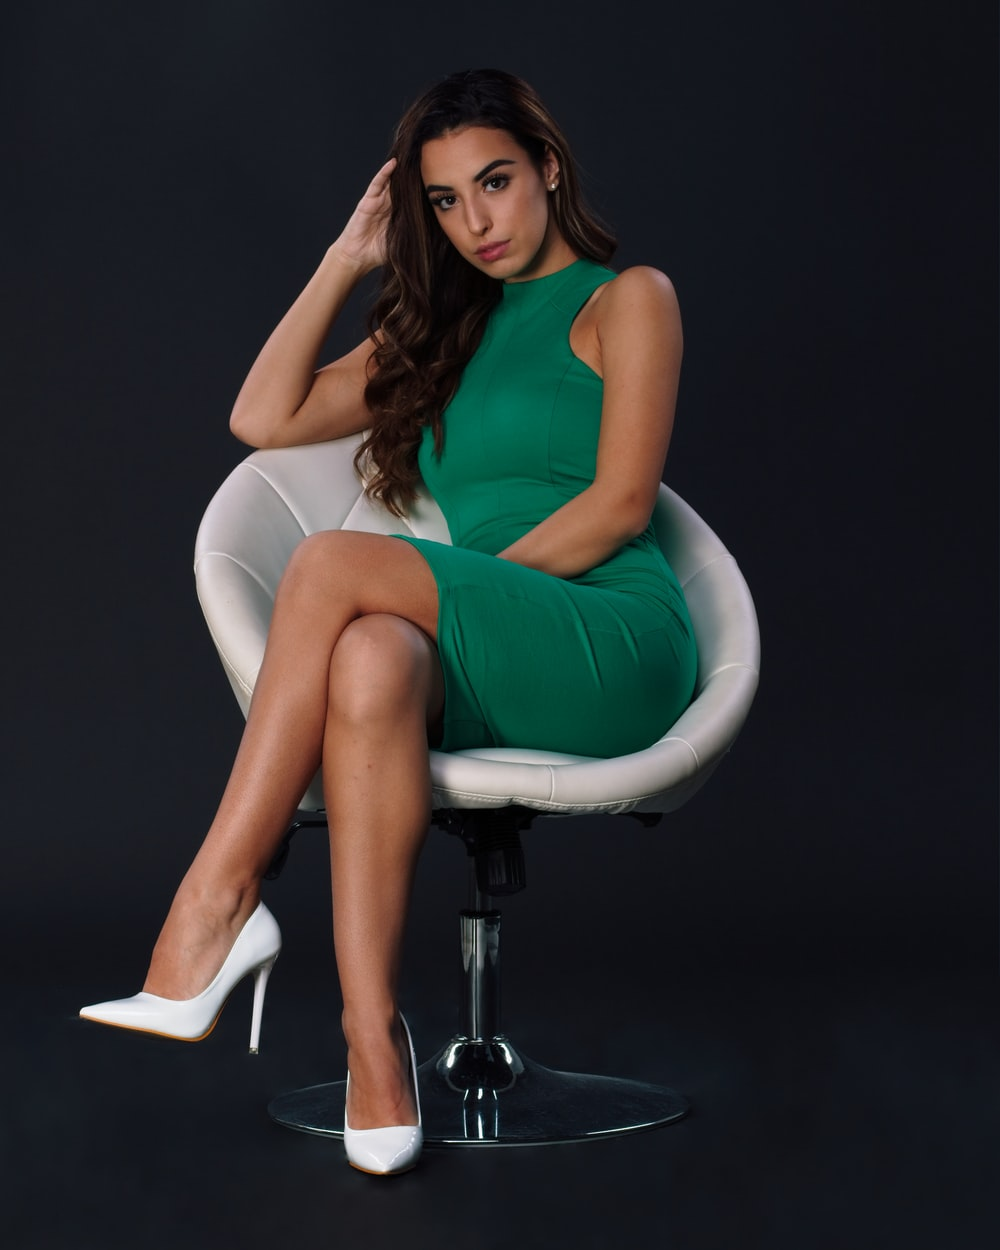 woman wearing green sleeveless dress sitting with crossed legs